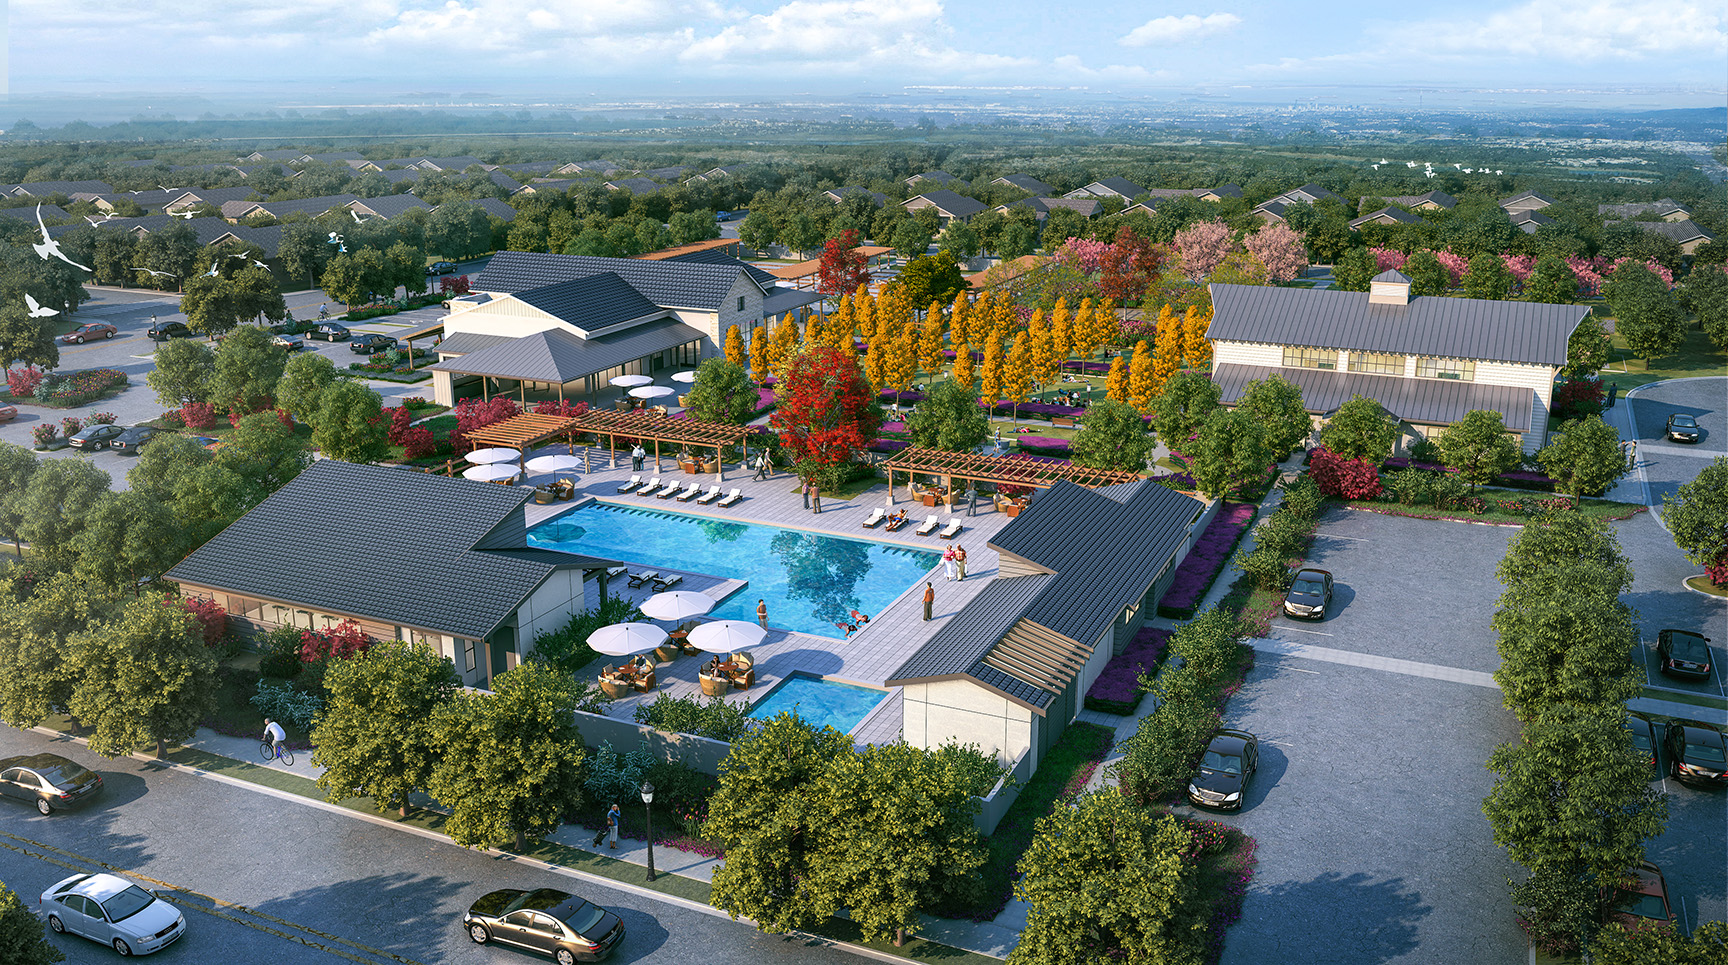 LGI Homes Breaks Ground for Amenity Center at 55+ Community